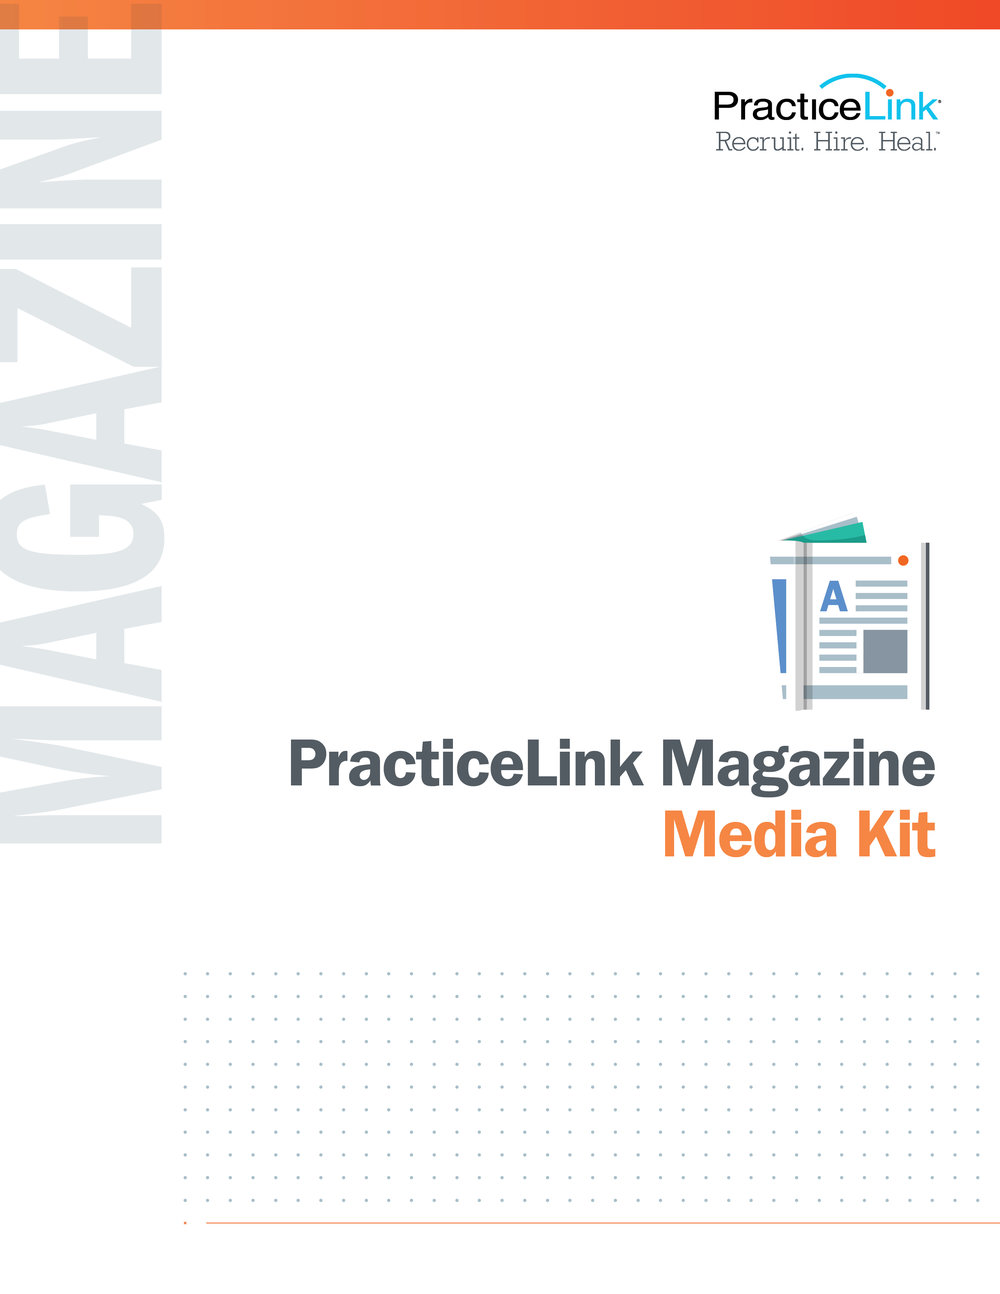 PL_Magazine_2014-15_Media_Kit (dragged) 1.jpg